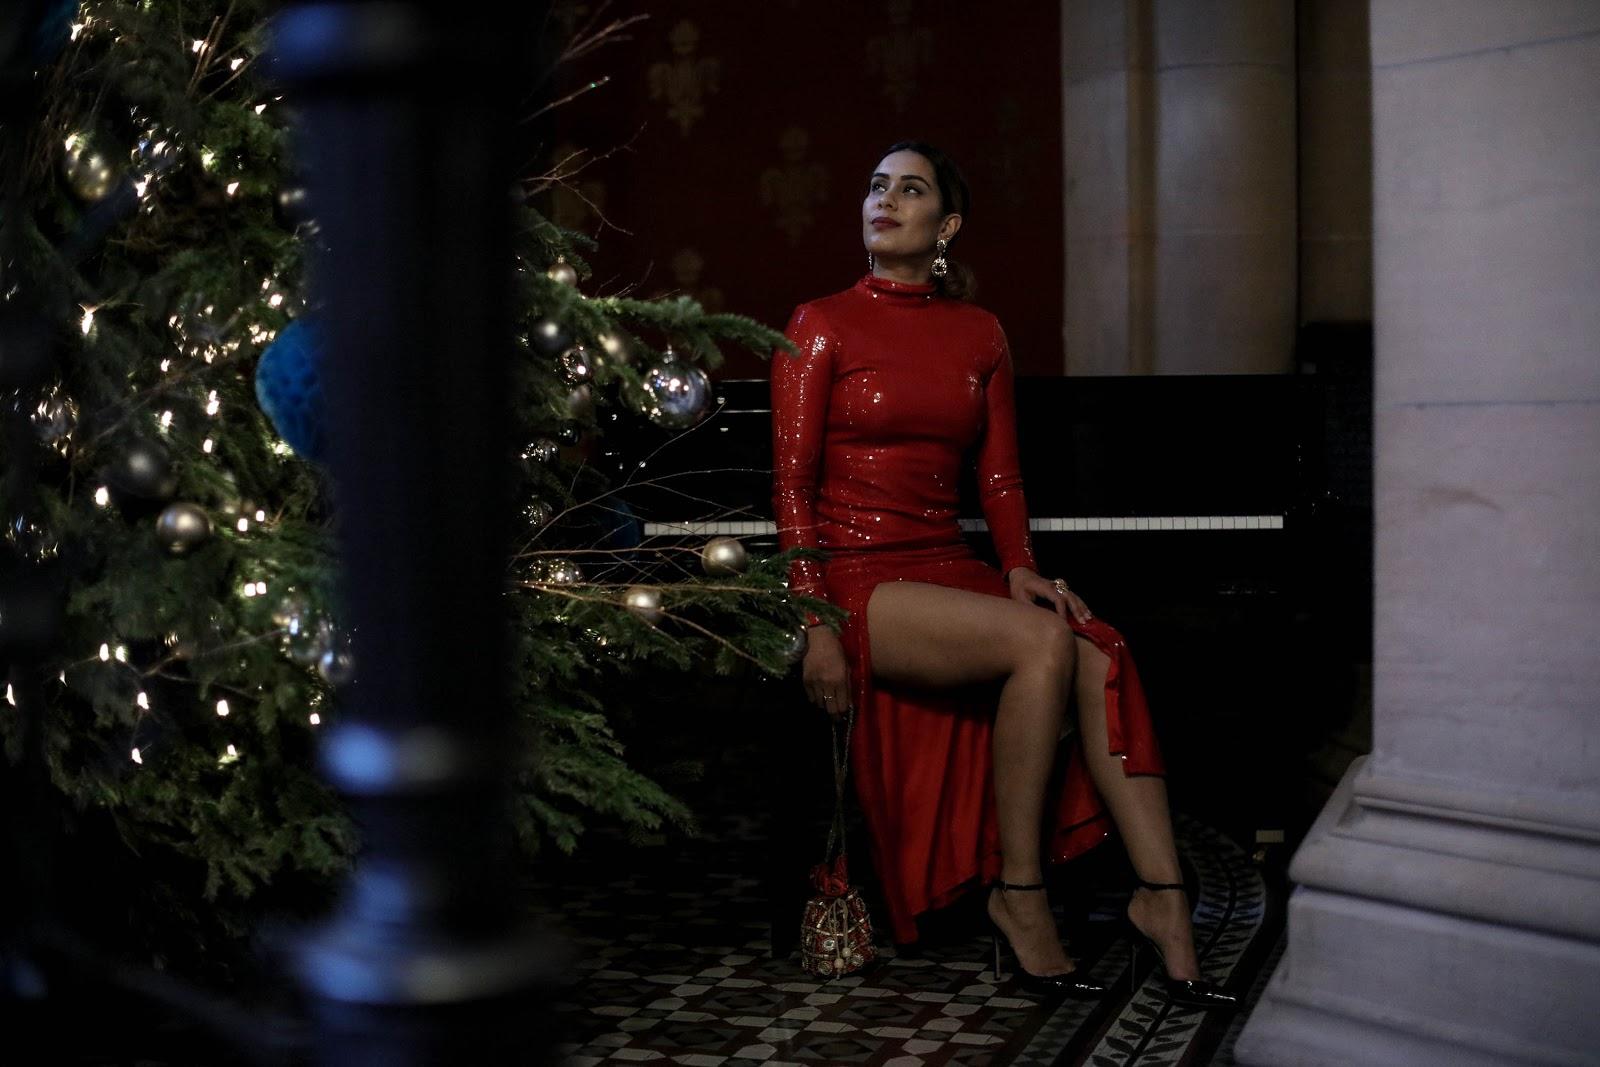 Reena Rai wearing Ashish x Warehouse red sequin dress for Christmas